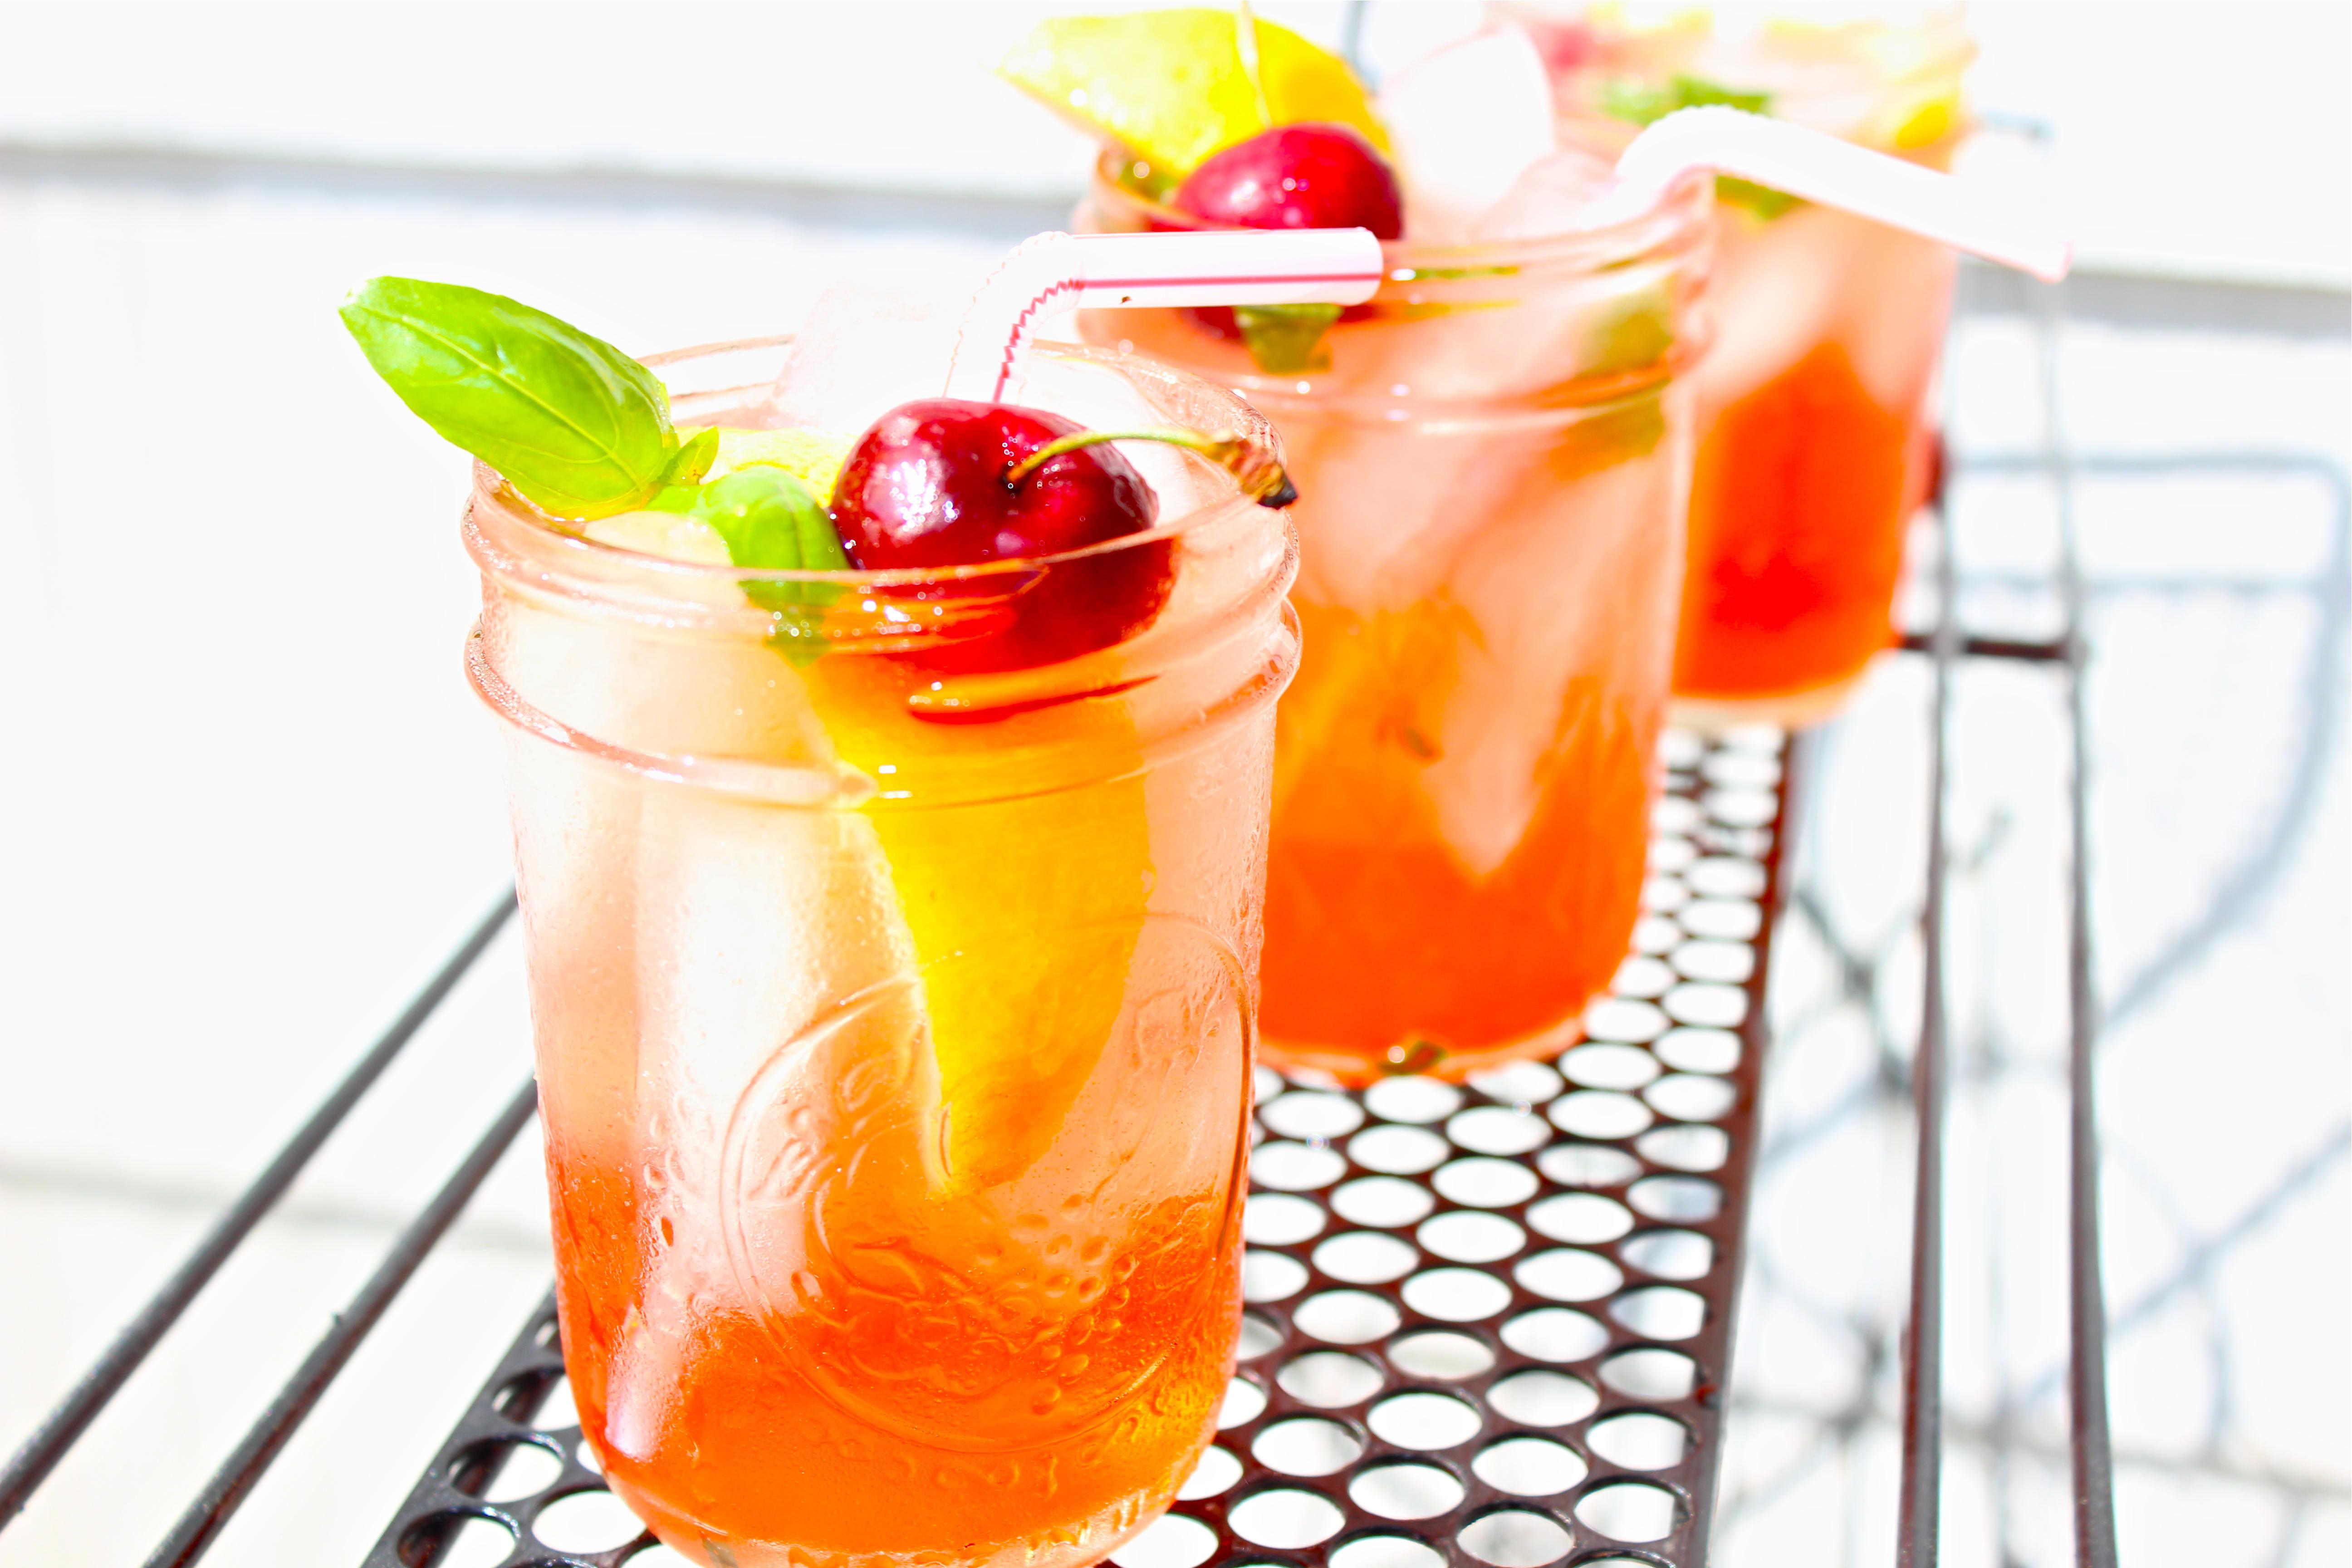 Recipe: Cherry Sour Cocktail